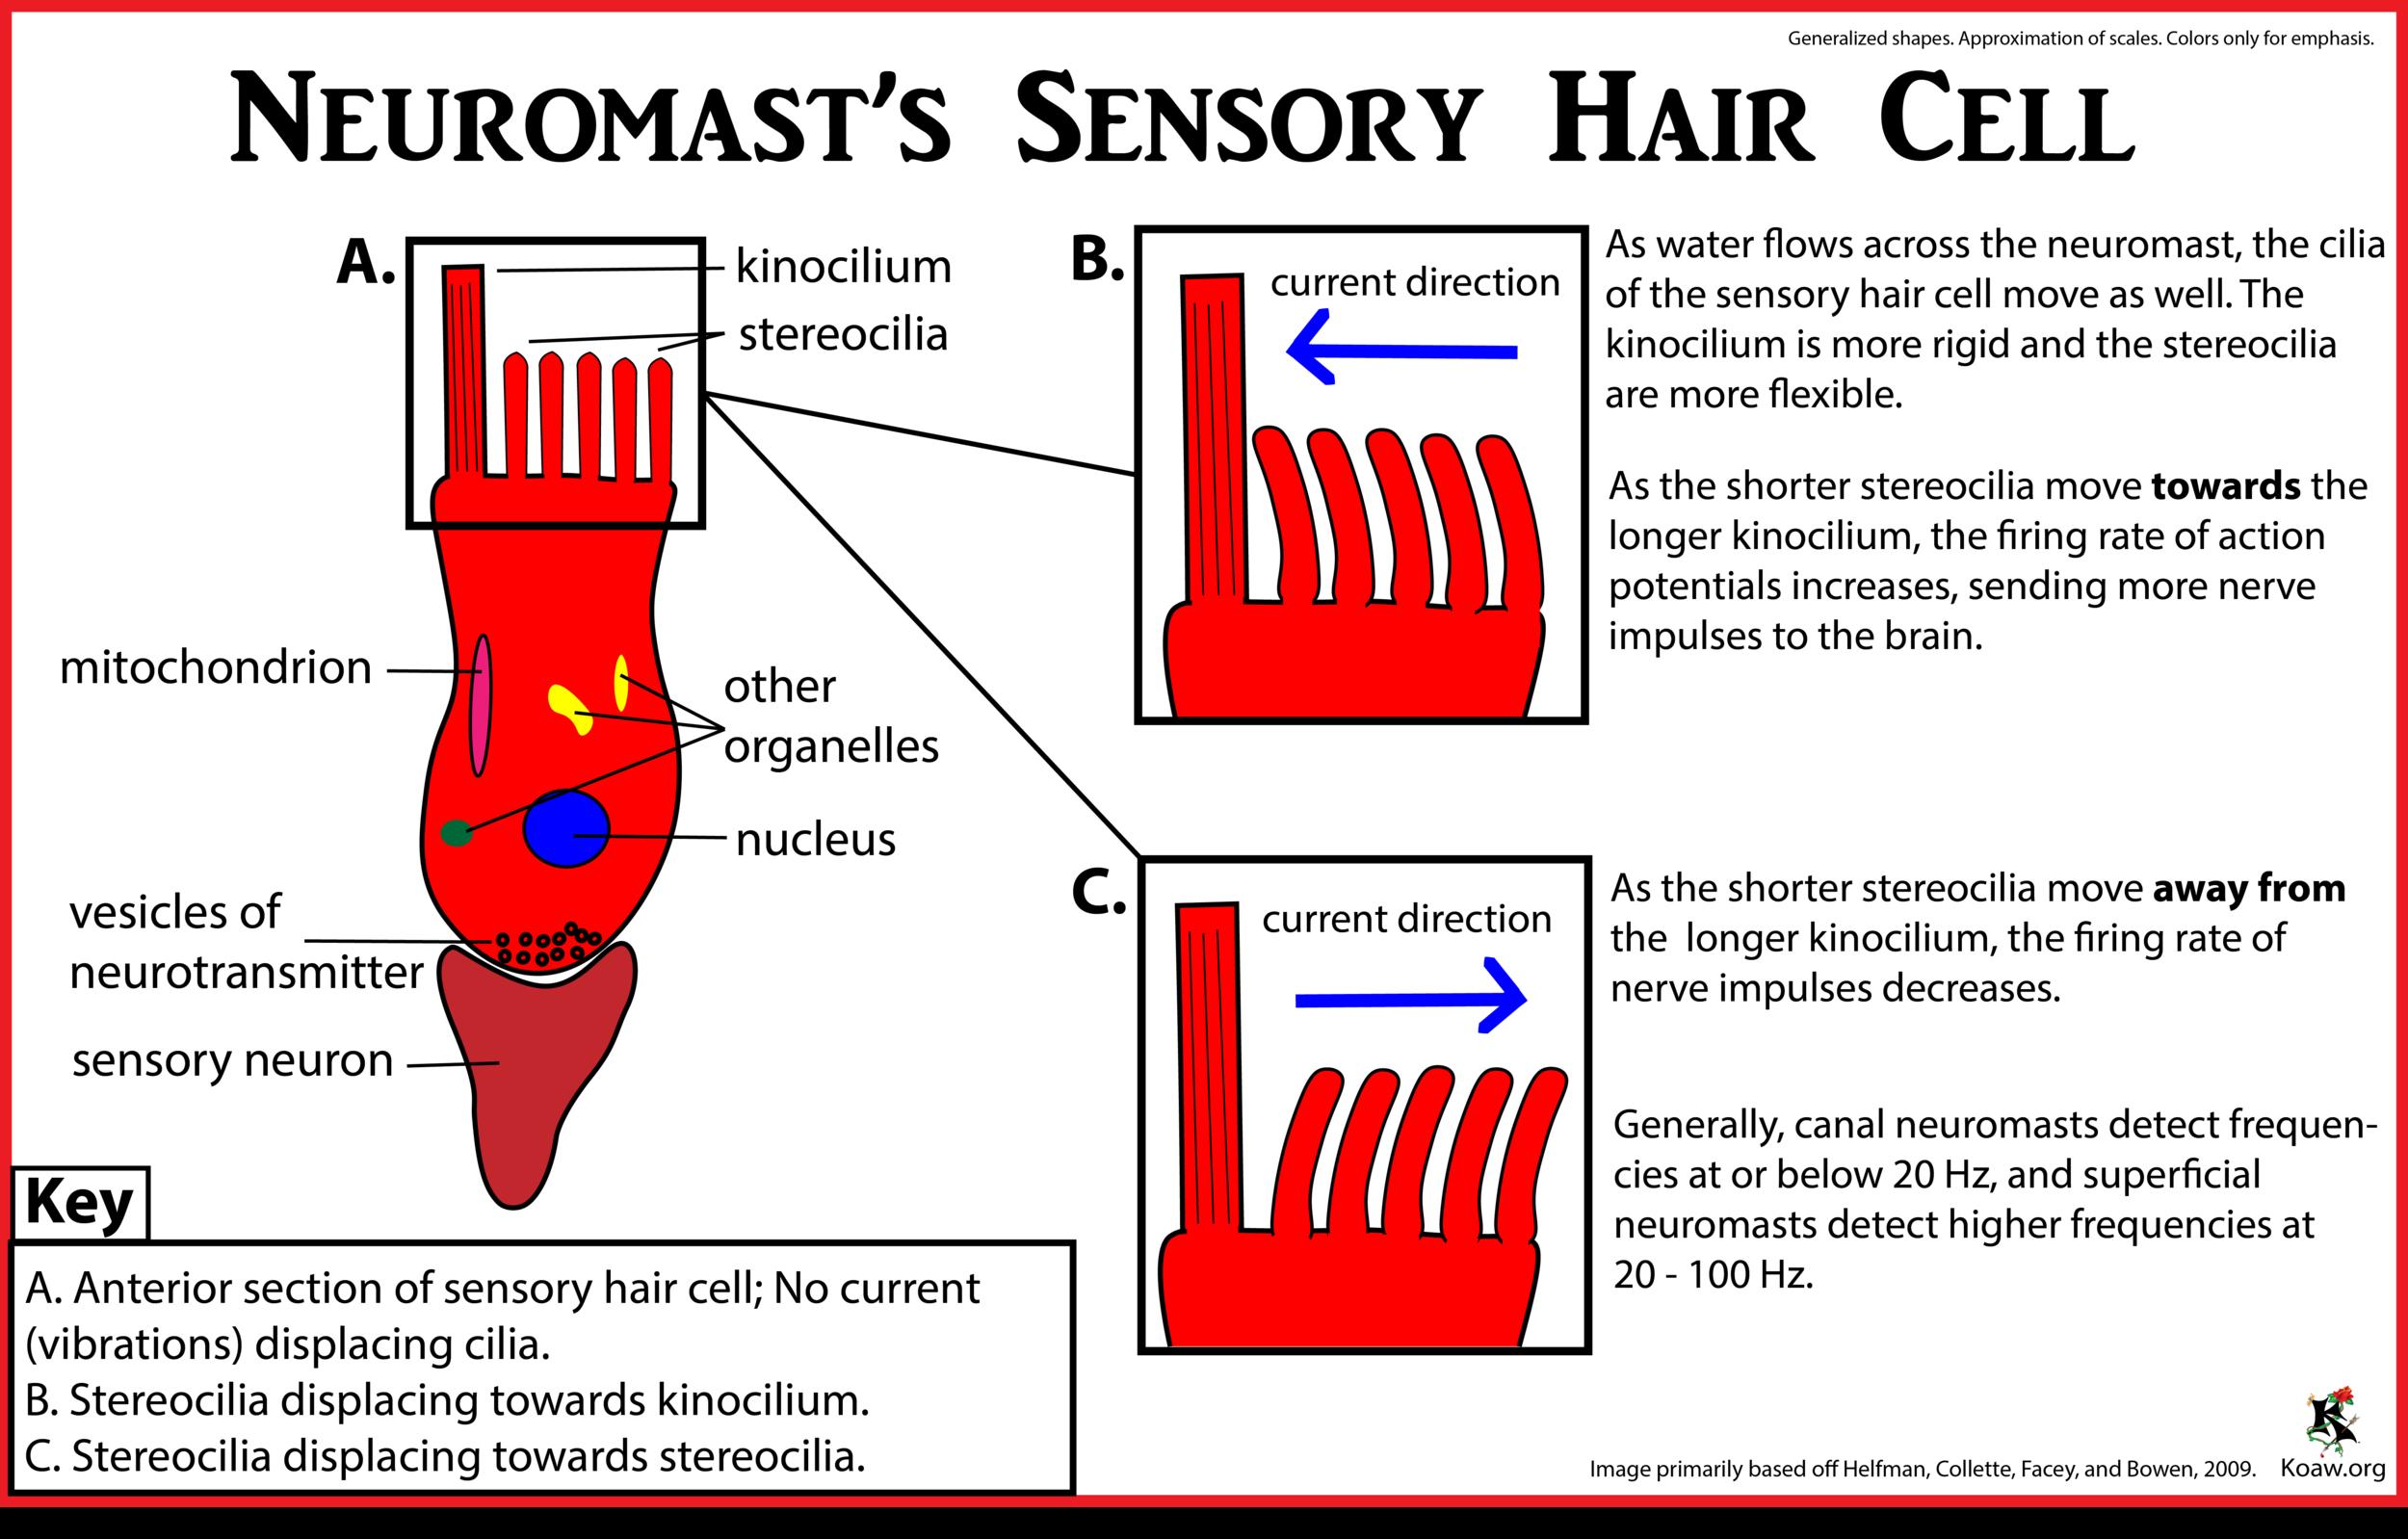 Sensory hair cell Koaw Org.png